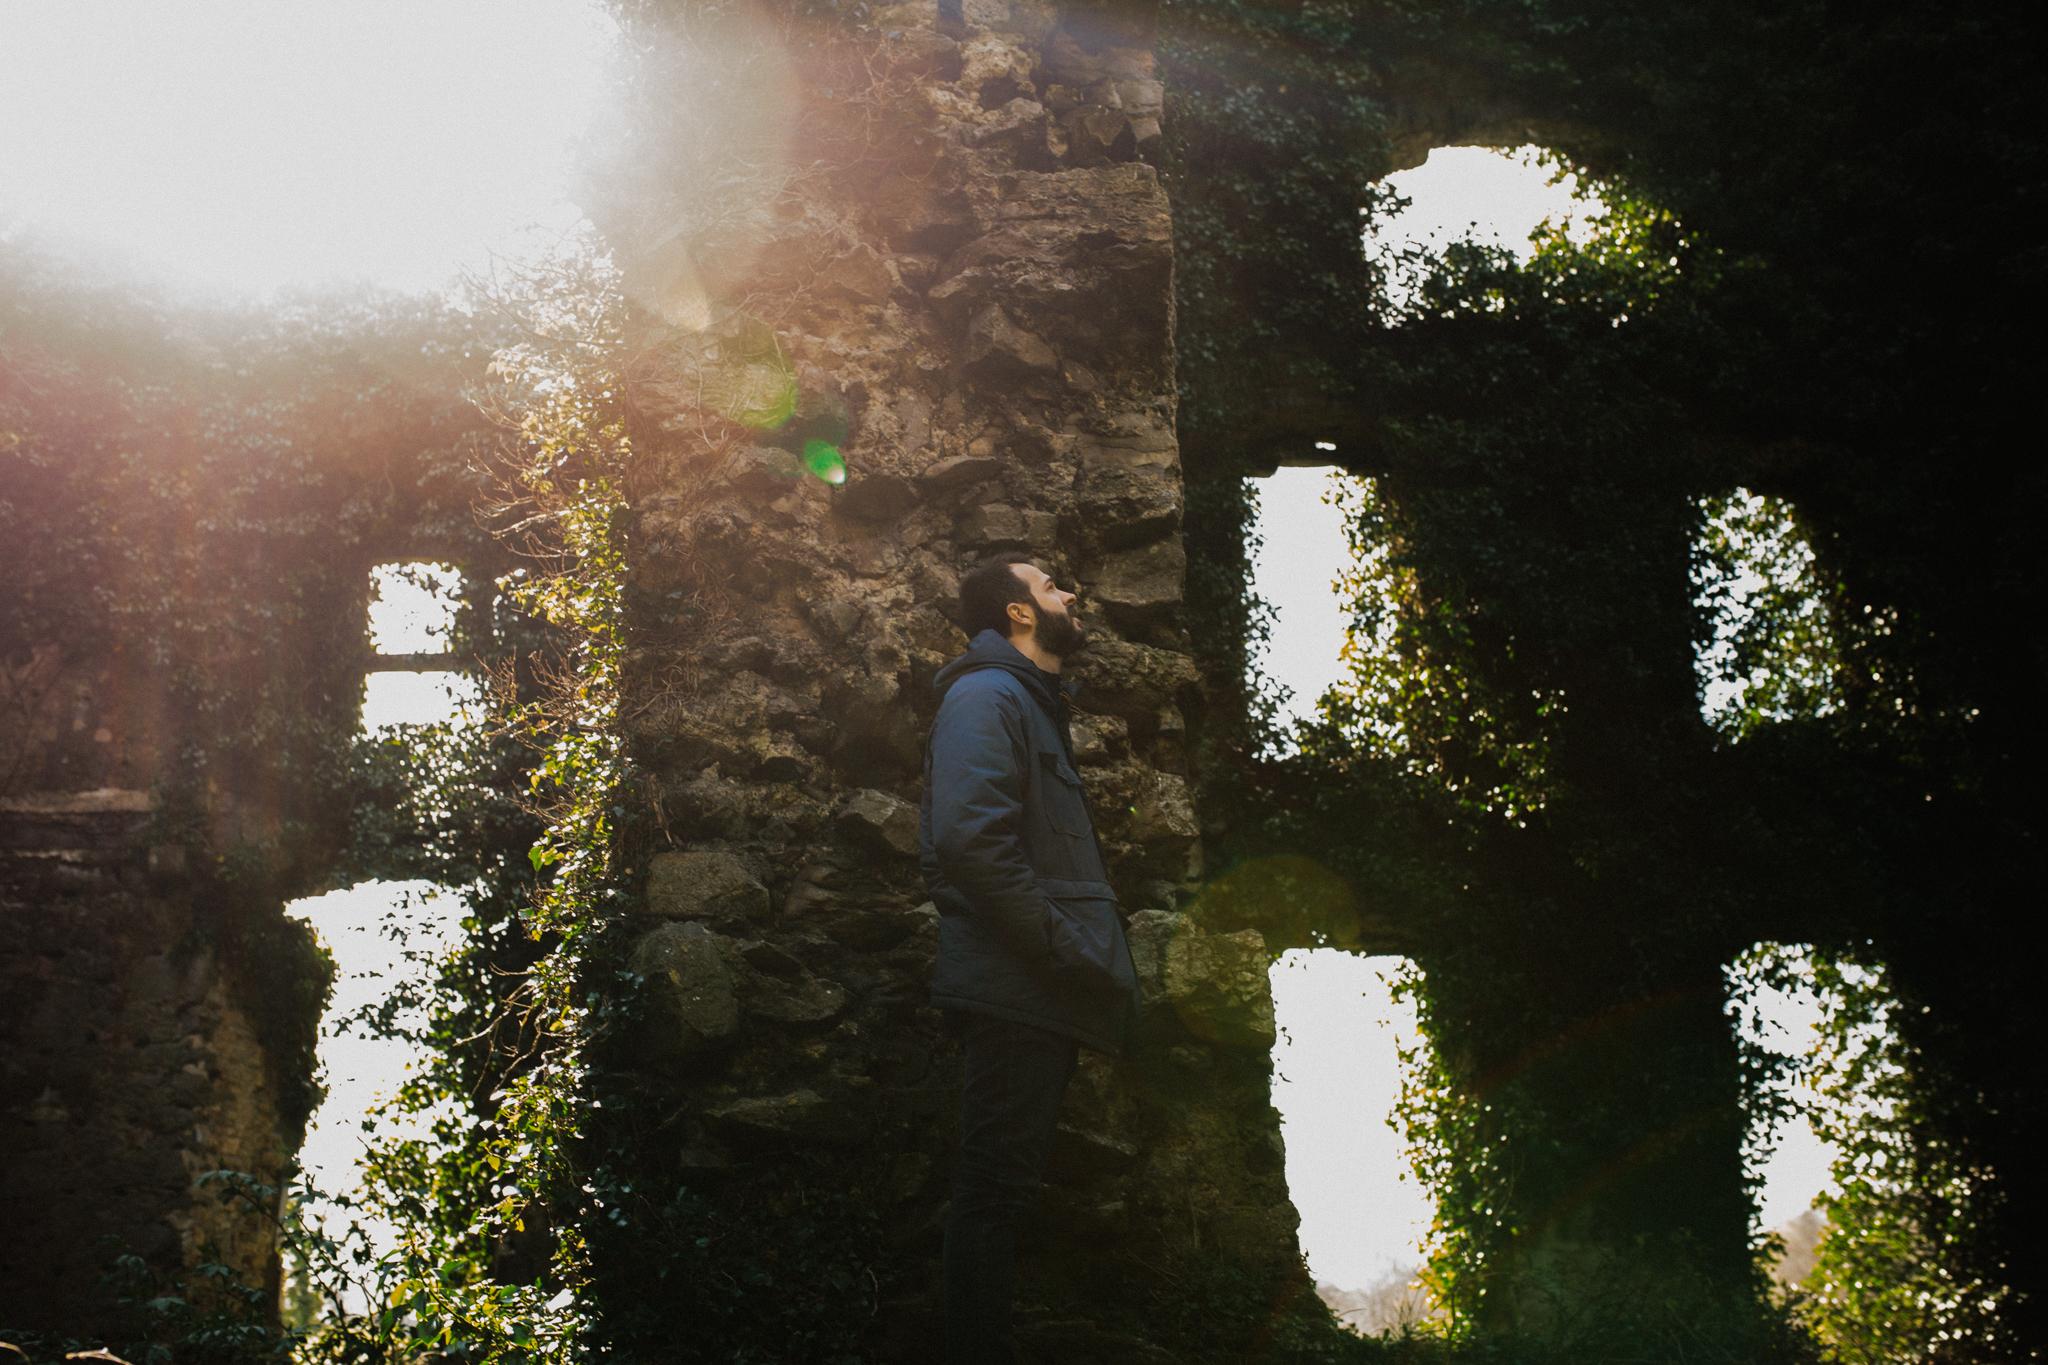 ireland_galway_dublin_rebecca_burt_photography-7.jpg